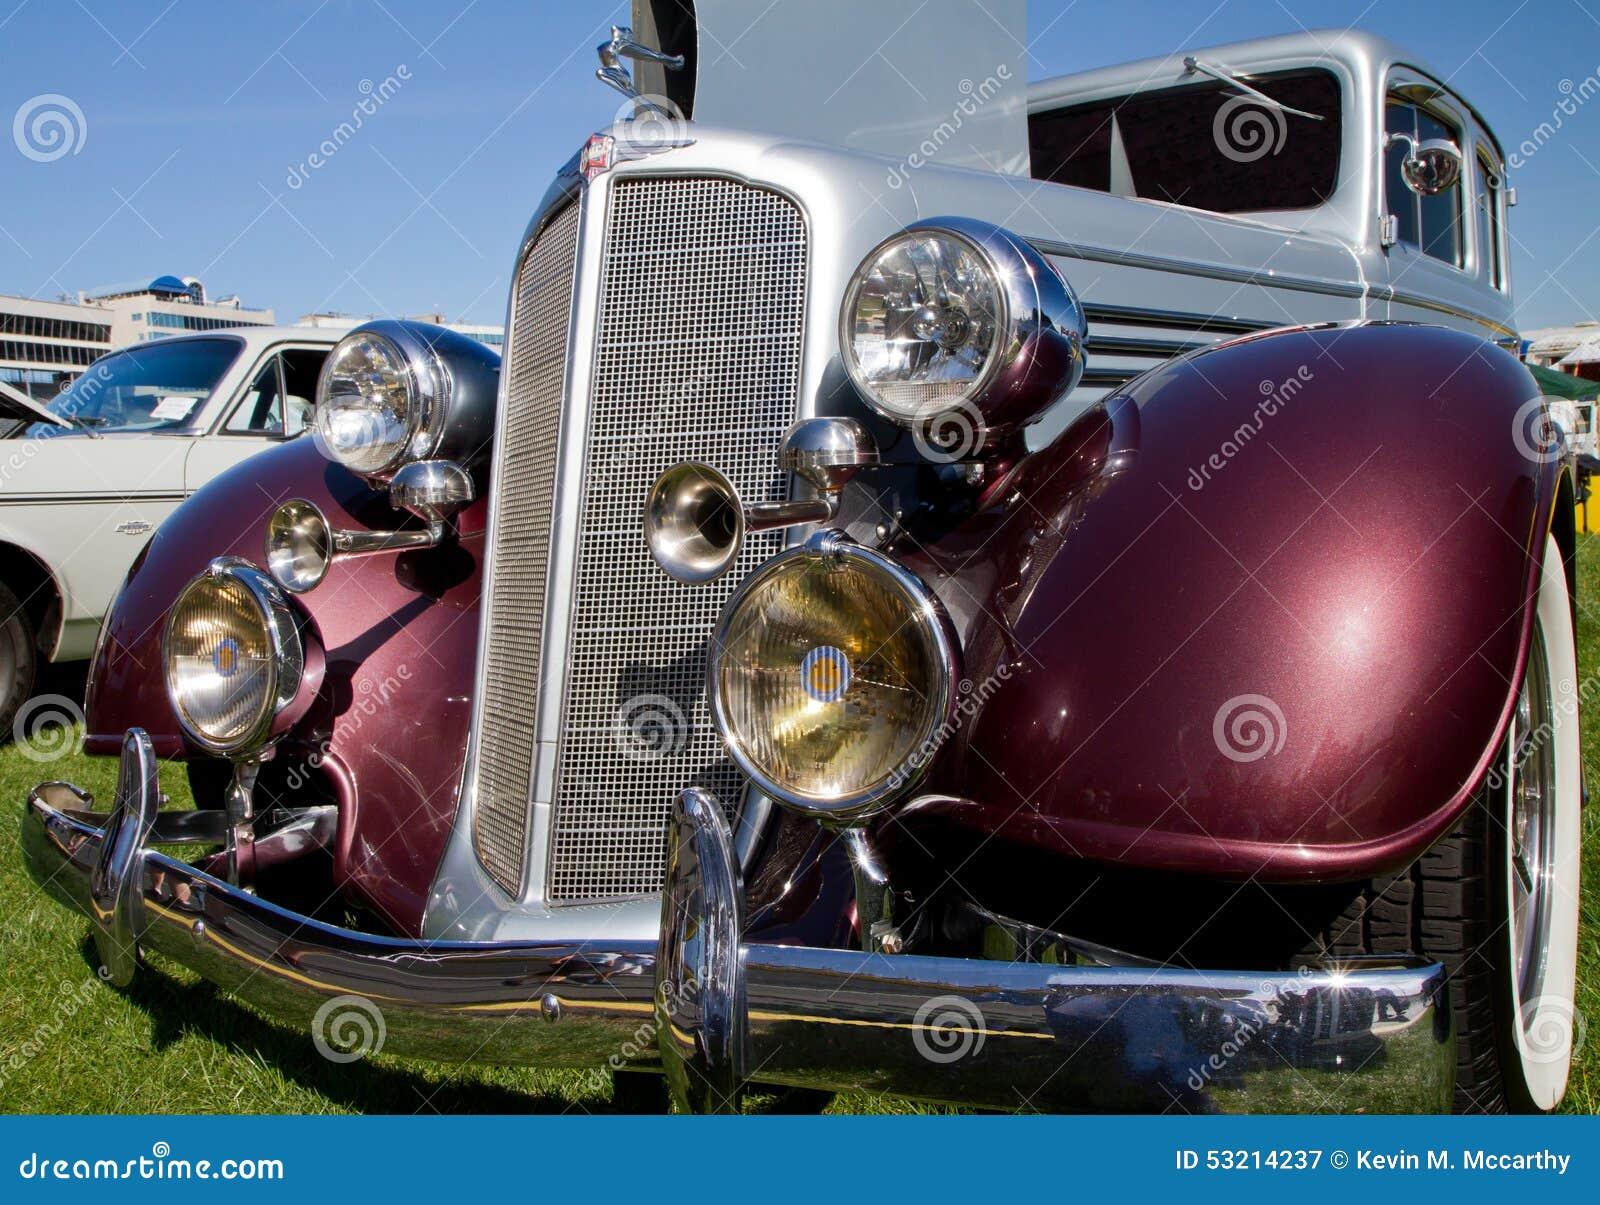 Enterprise Rental Car Charlotte Nc: Classic 1935 Buick Automobile Editorial Photography